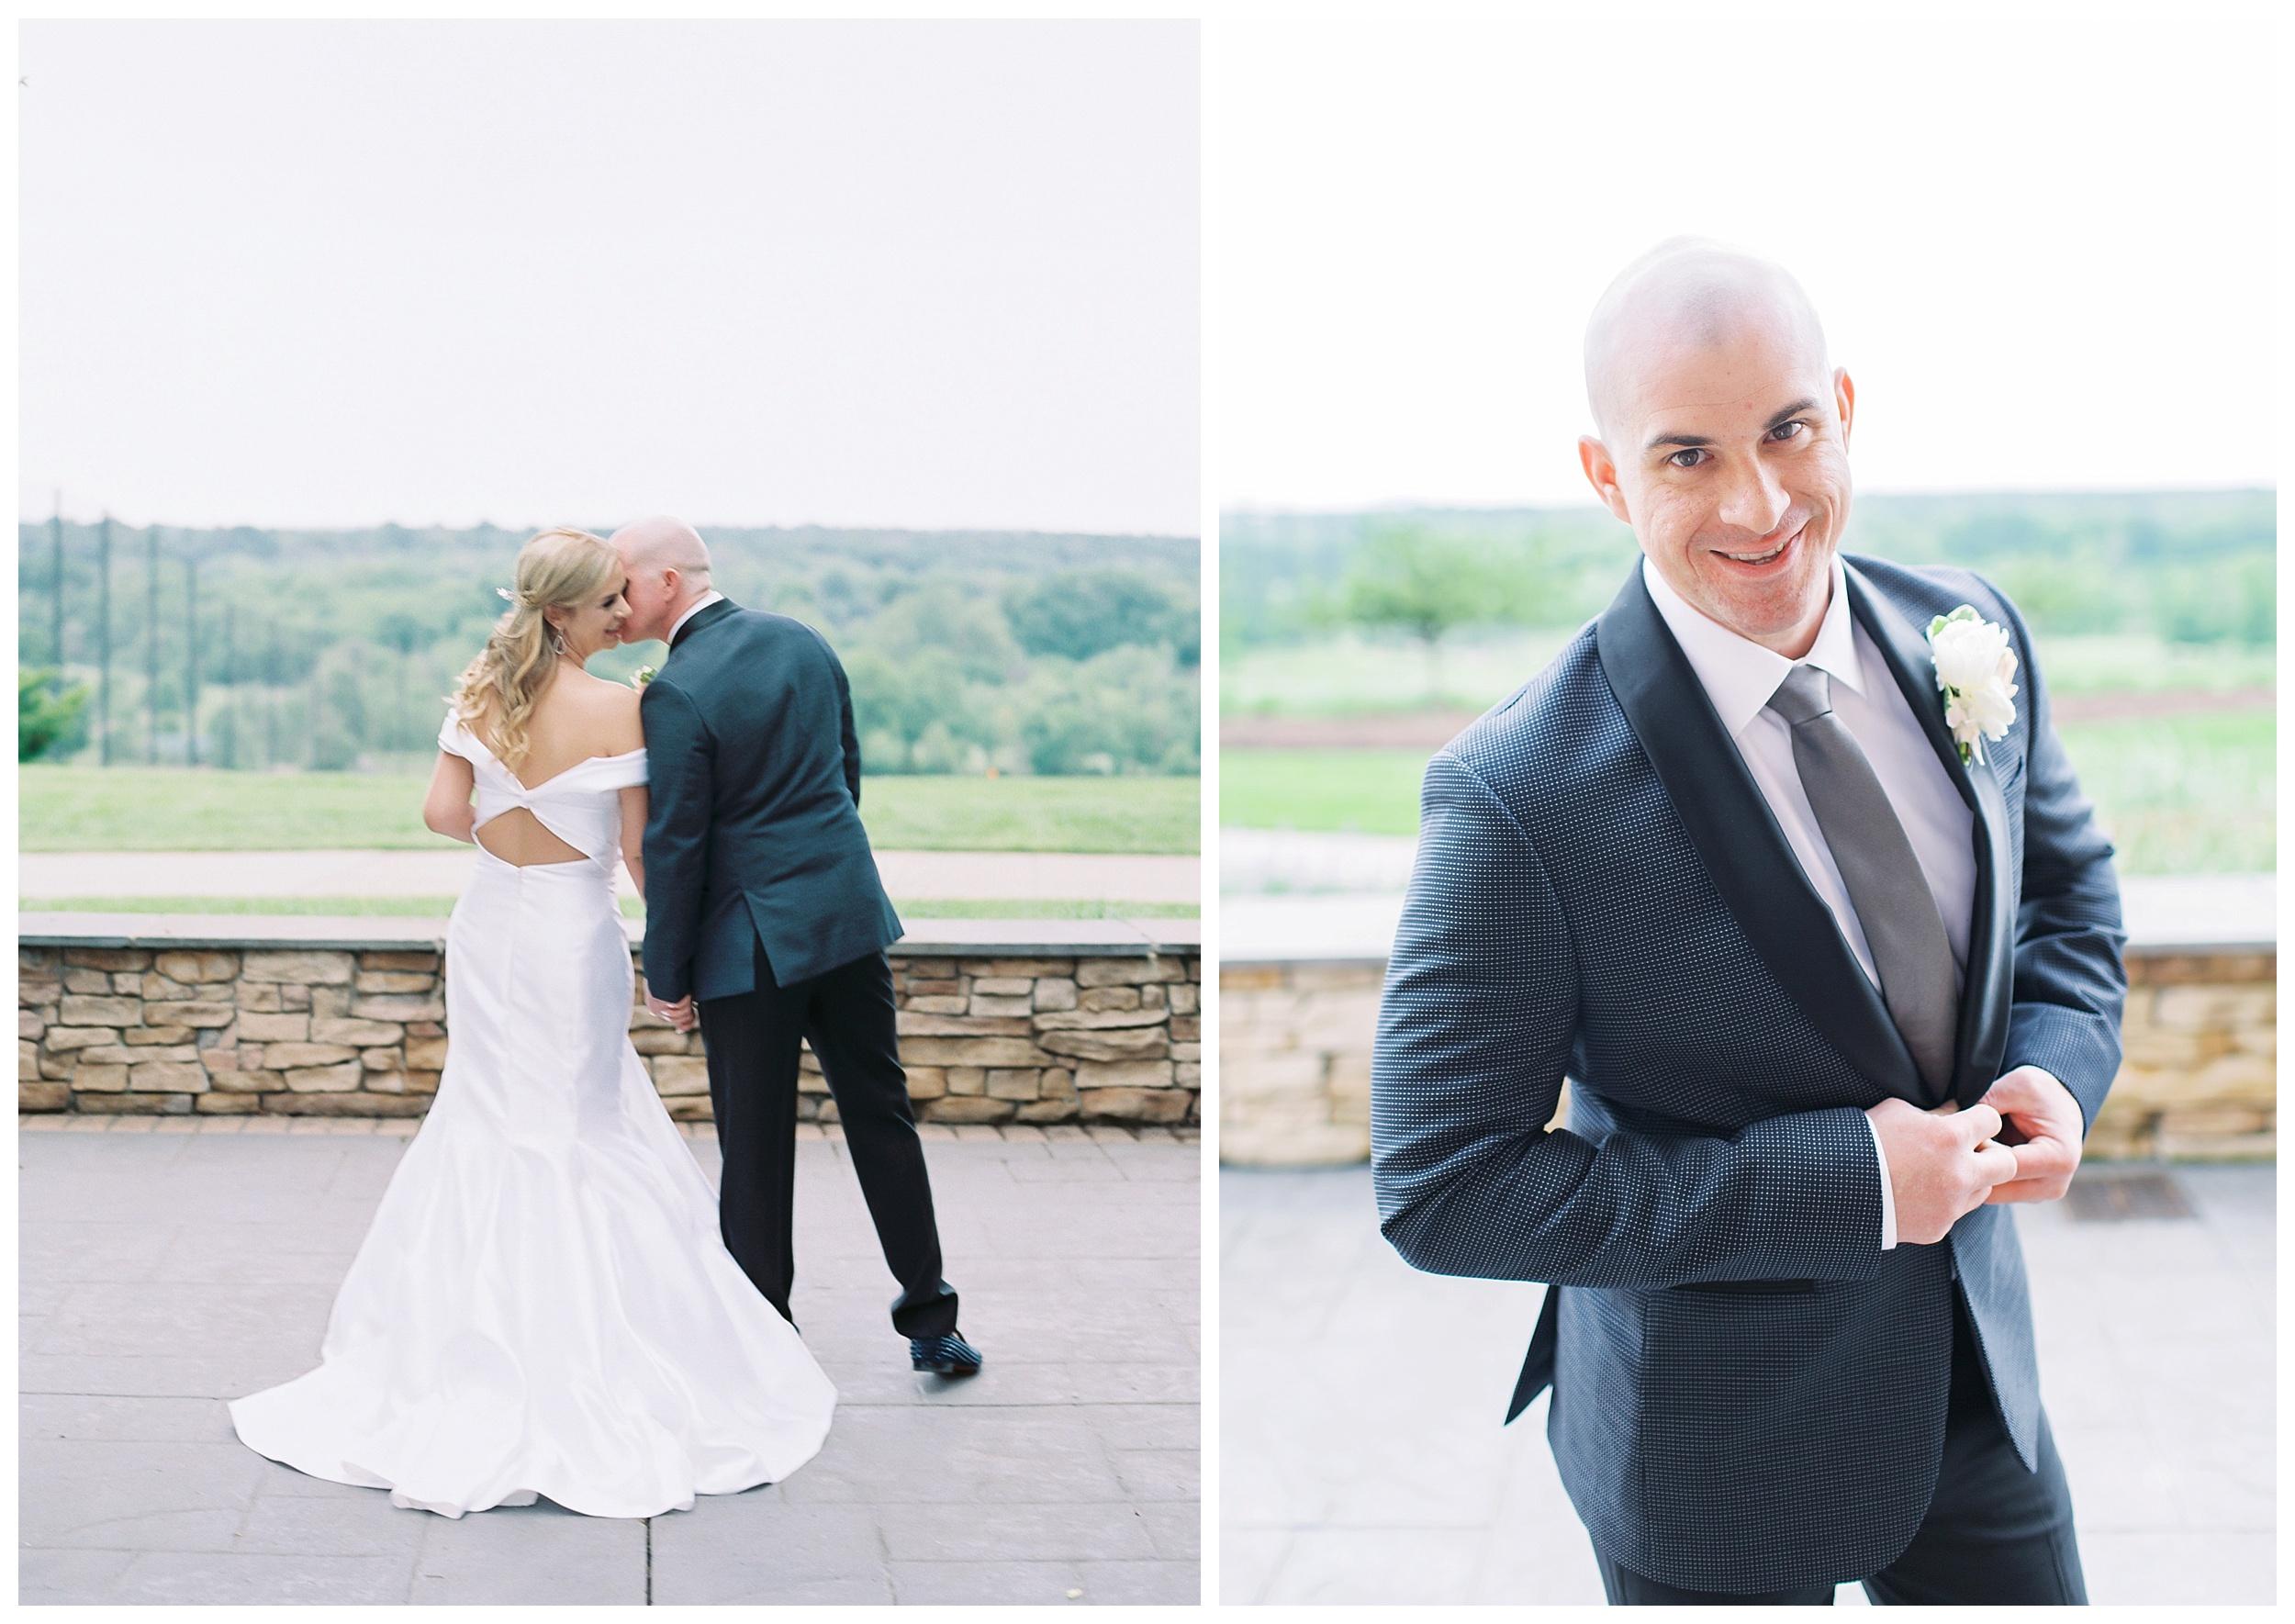 Lansdowne Resort Wedding | Virginia Film Wedding Photographer Kir Tuben_0040.jpg